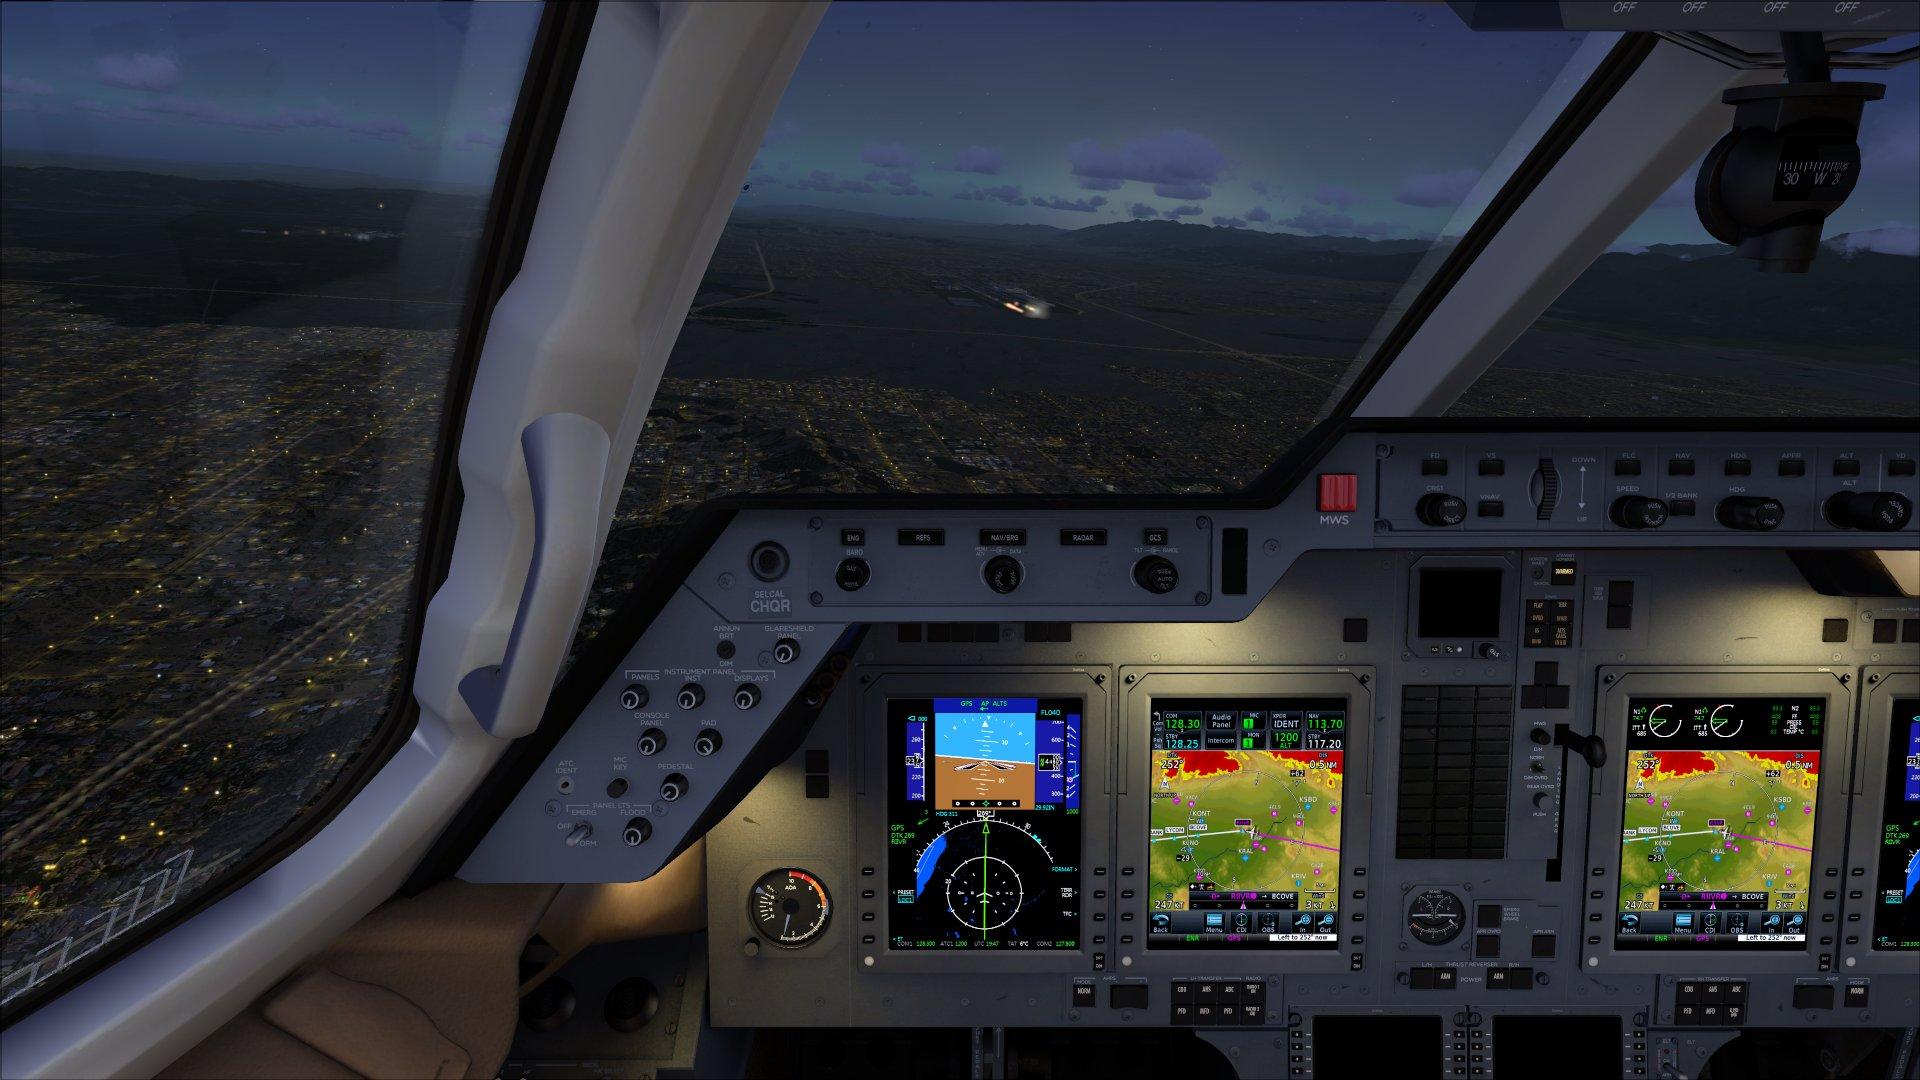 Flight1 Gtn Complete